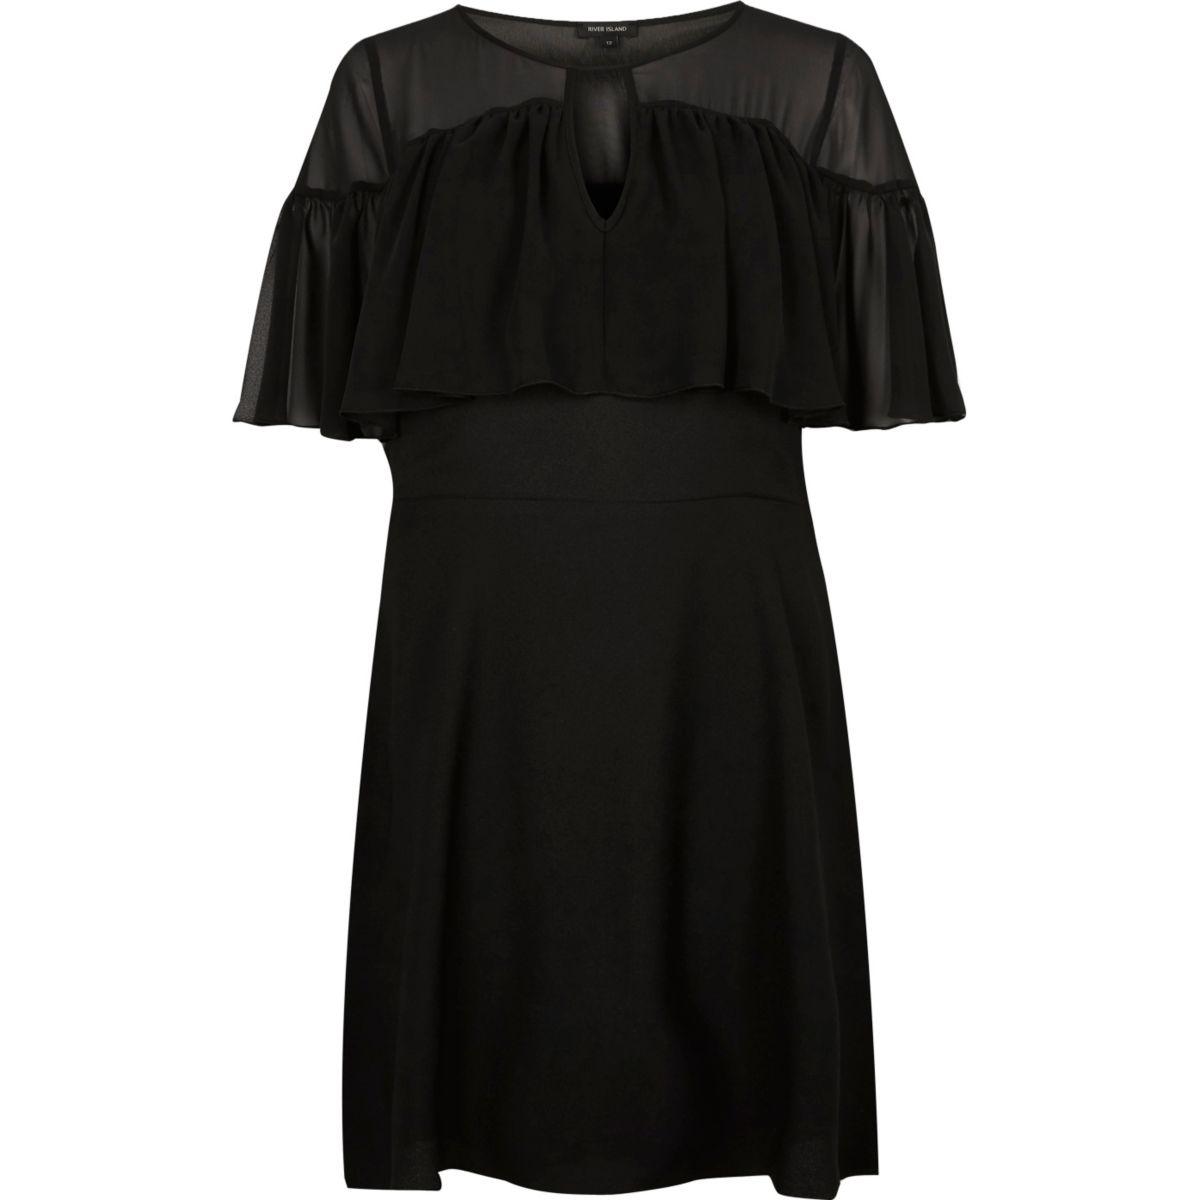 Black frill sleeve overlay dress